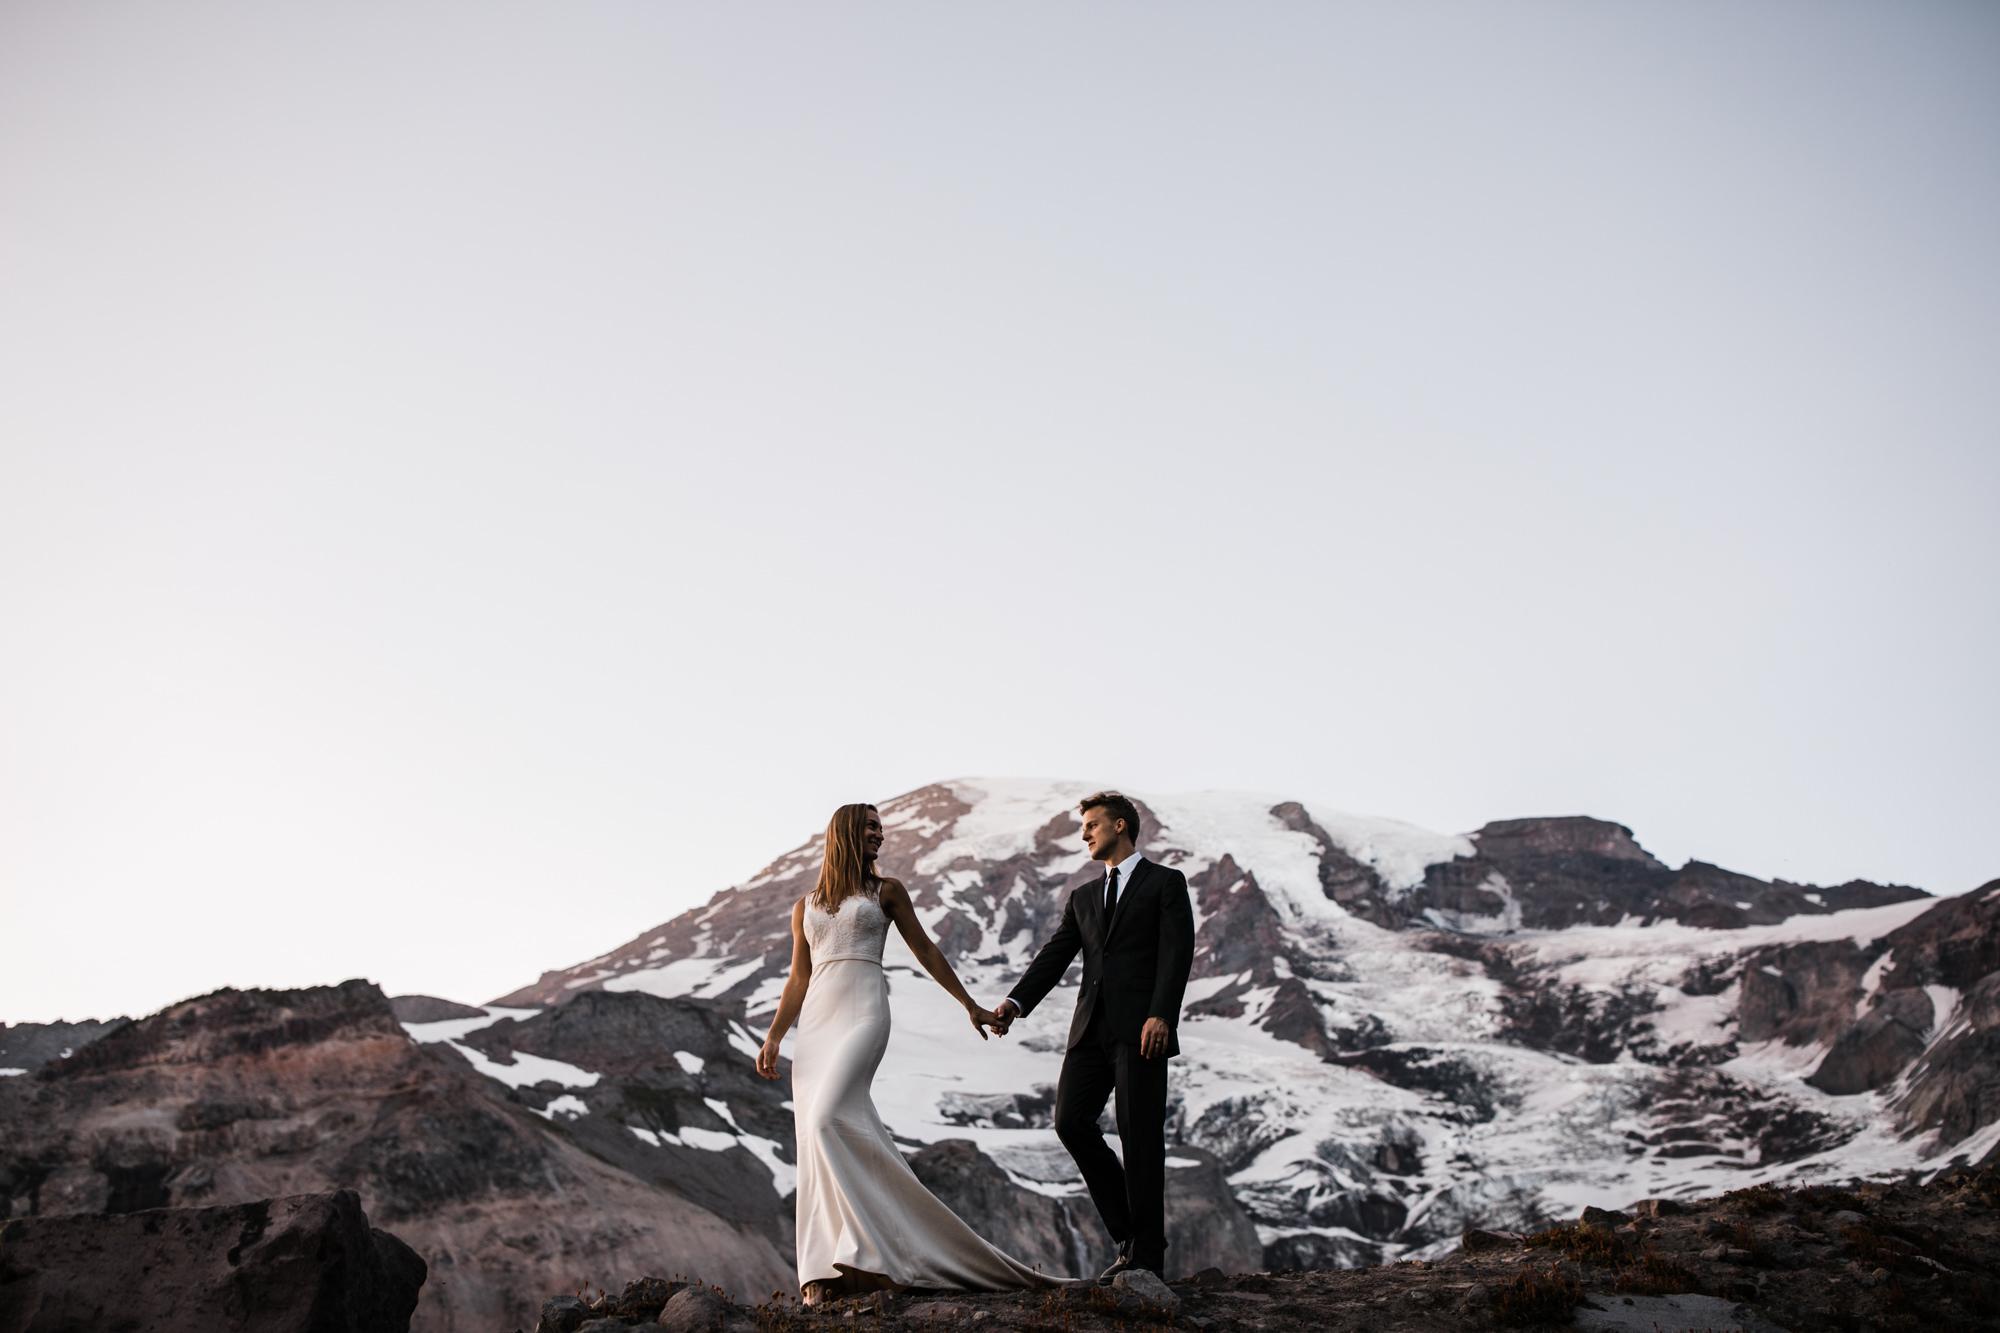 mount rainier intimate wedding adventure | destination adventure wedding photographers | the hearnes adventure photography | www.thehearnes.com